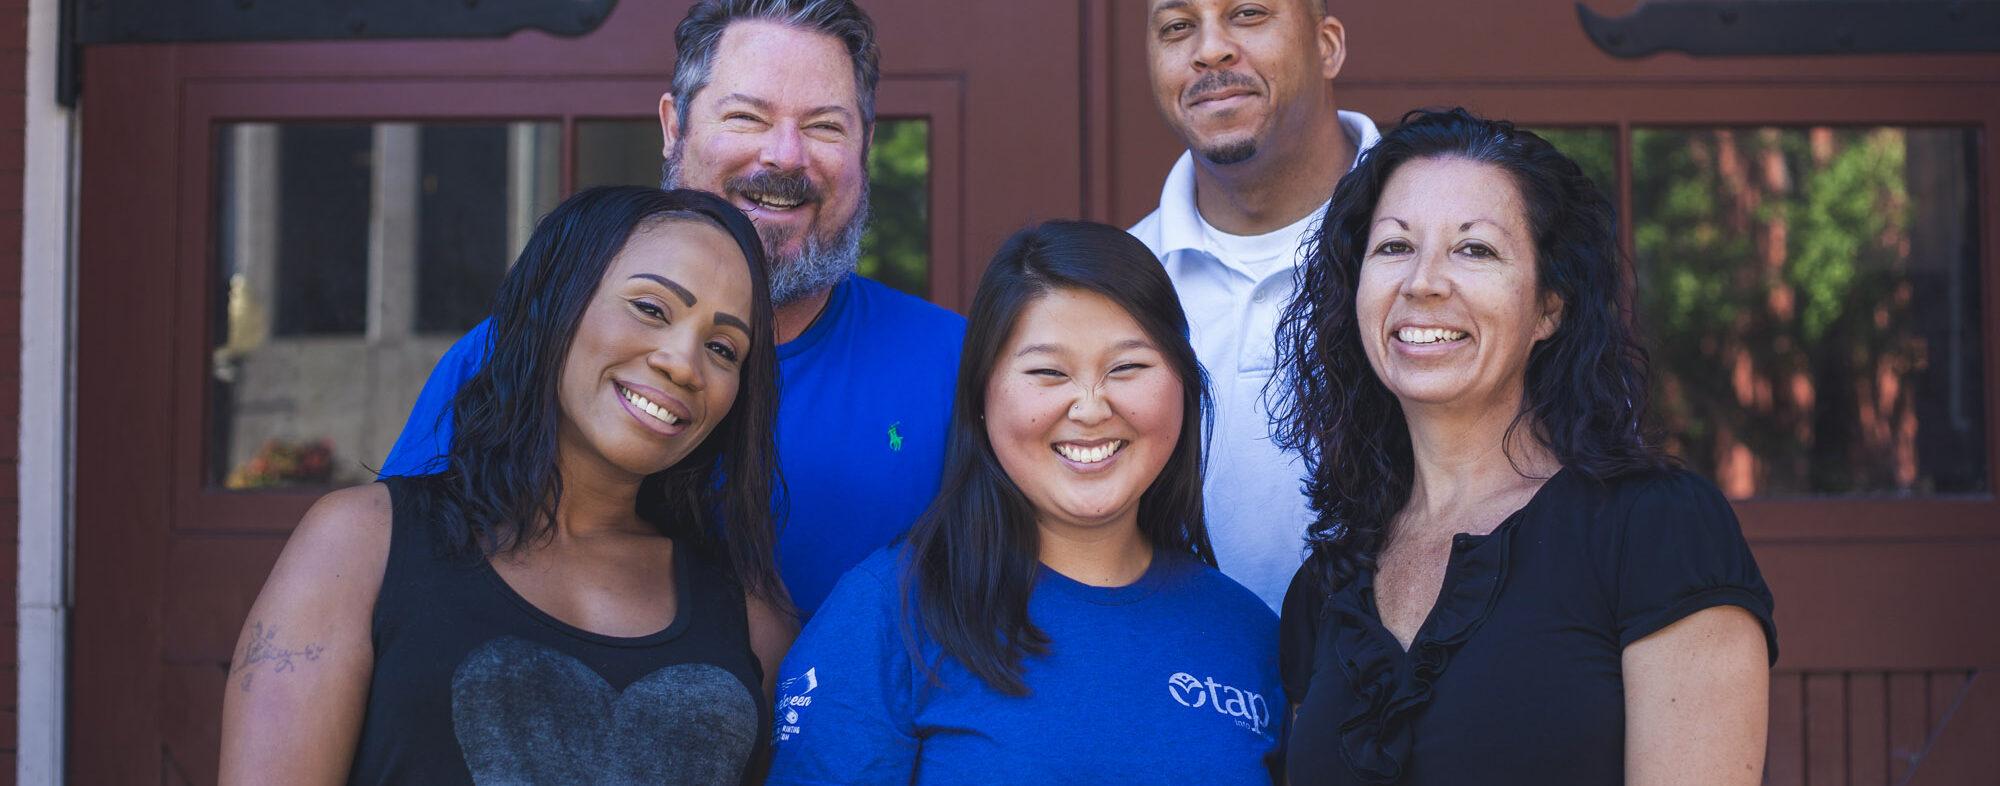 TAP staff, volunteer, and interns